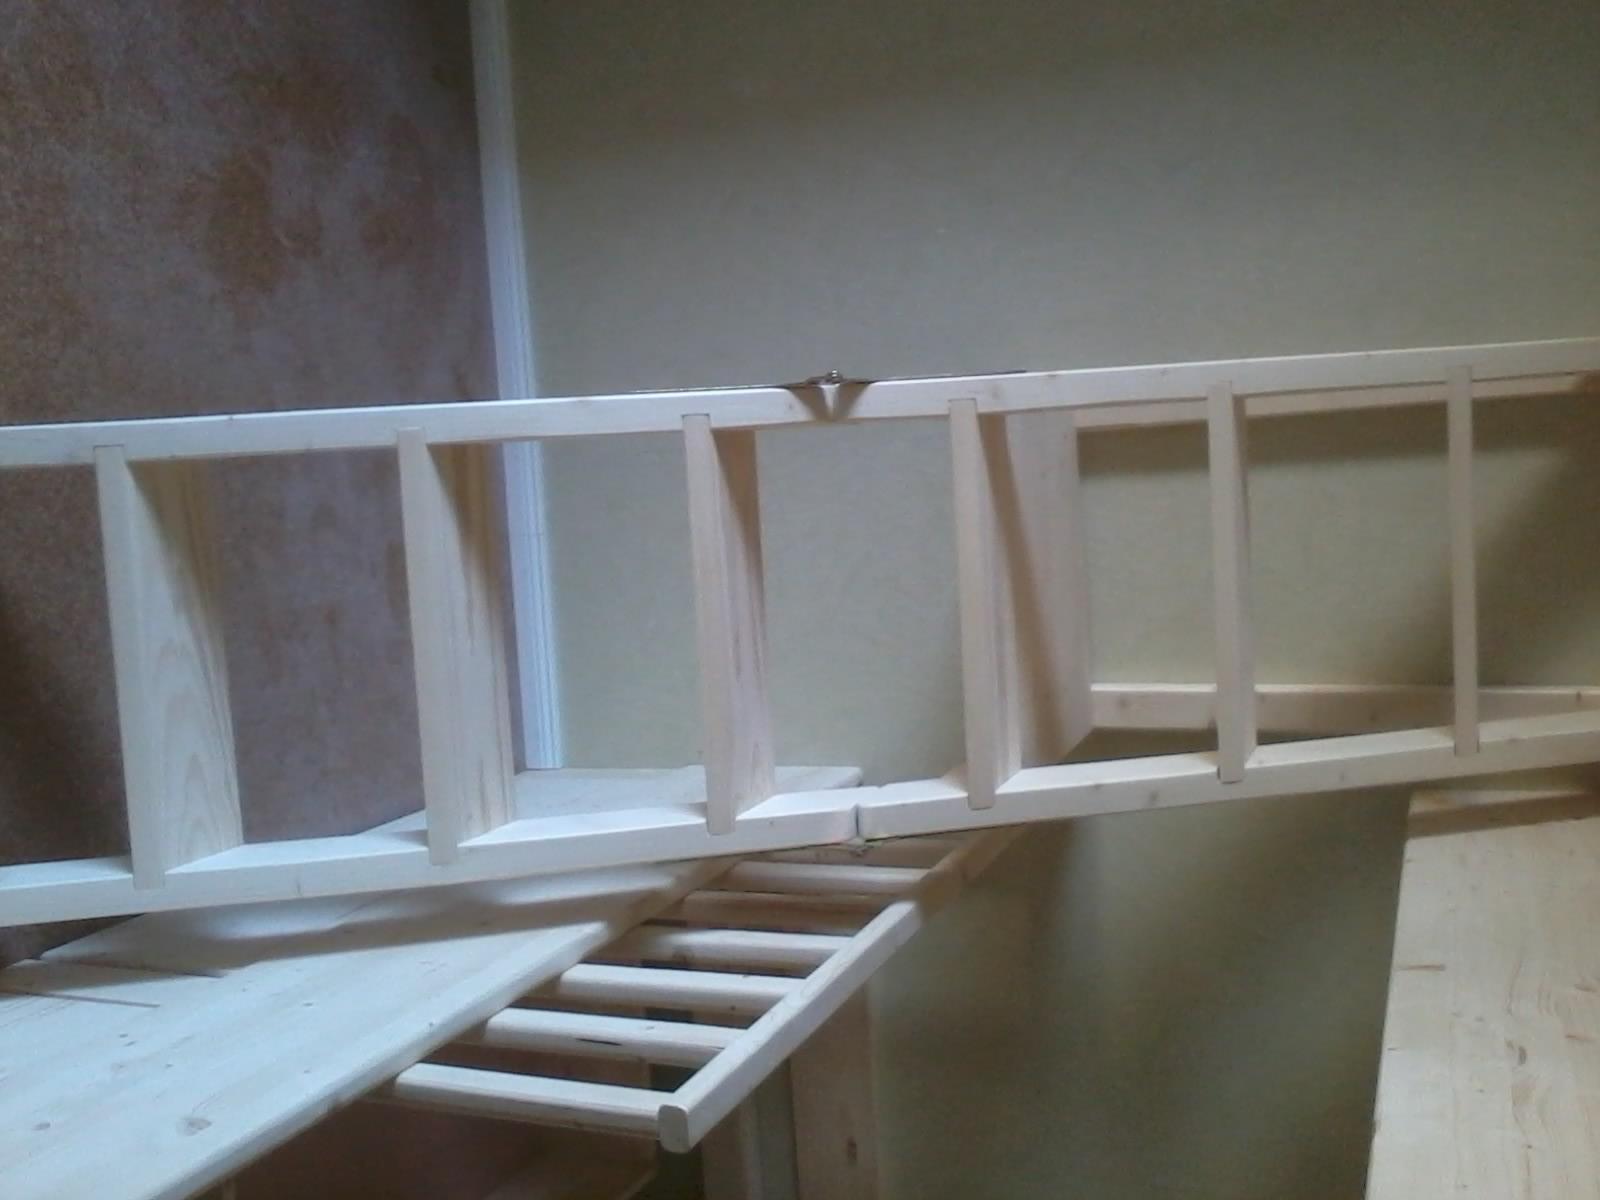 Doppelstockbett mit beleuchtung - Doppelstockbett mit treppe ...